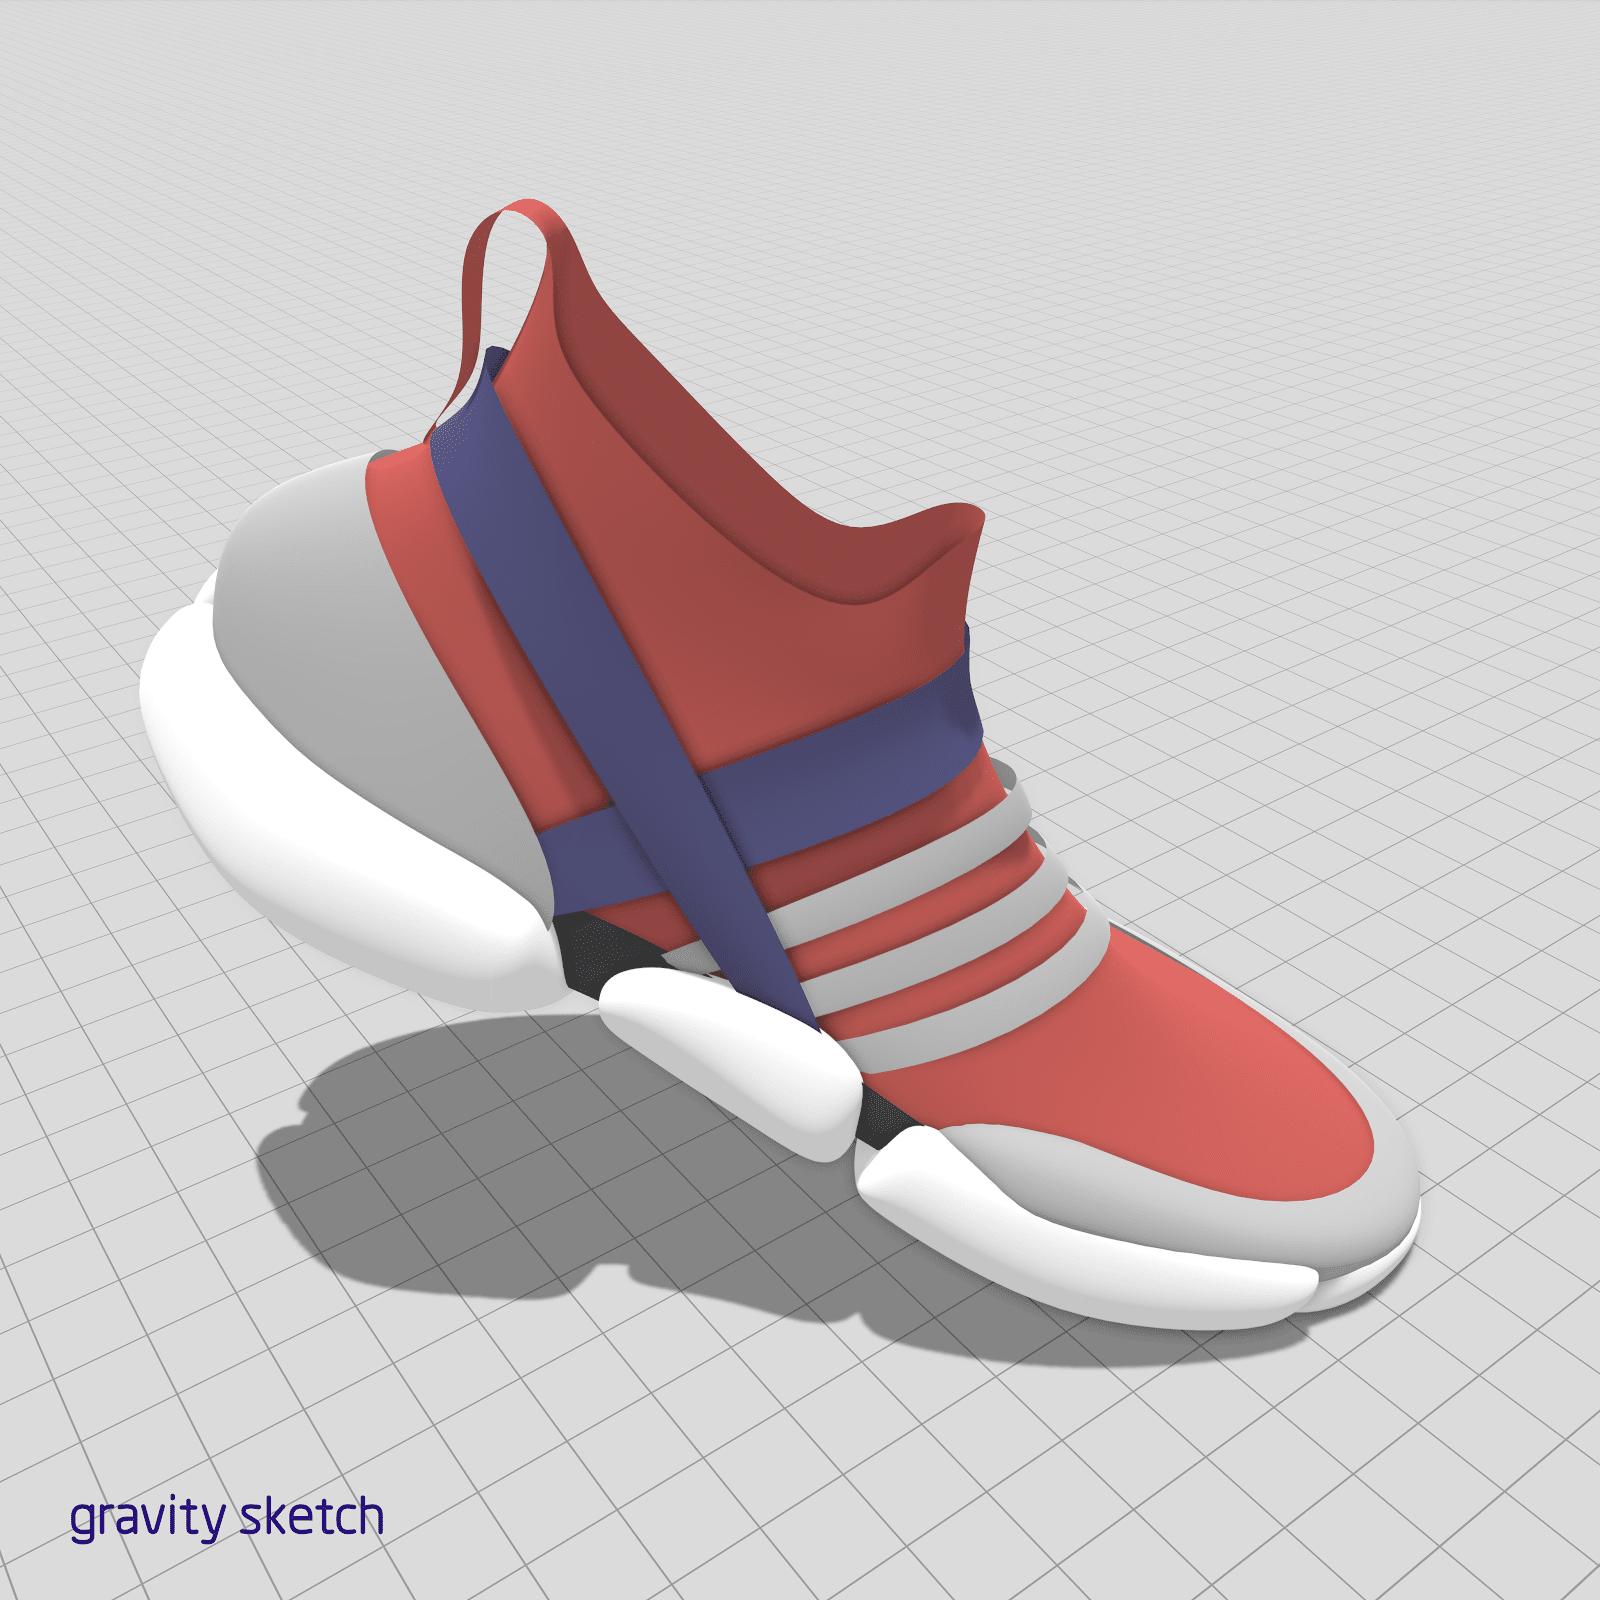 Red, grey & blue shoe designed in Gravity Sketch by Sosa Fresh